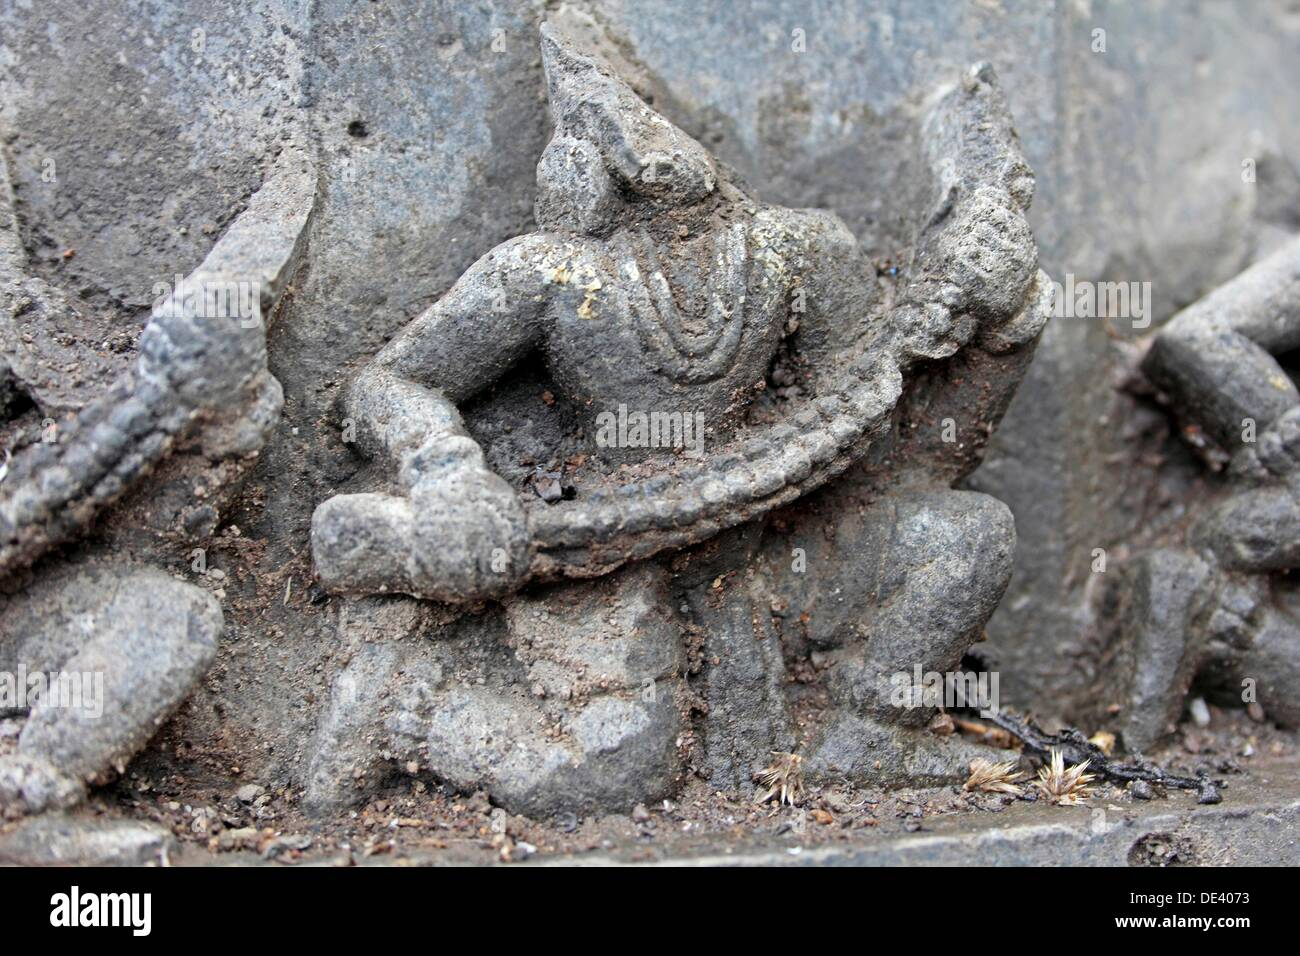 Carving at Shri bhiravnath Temple of Lord Shiva at Kikli, Maharashtra, India - Stock Image